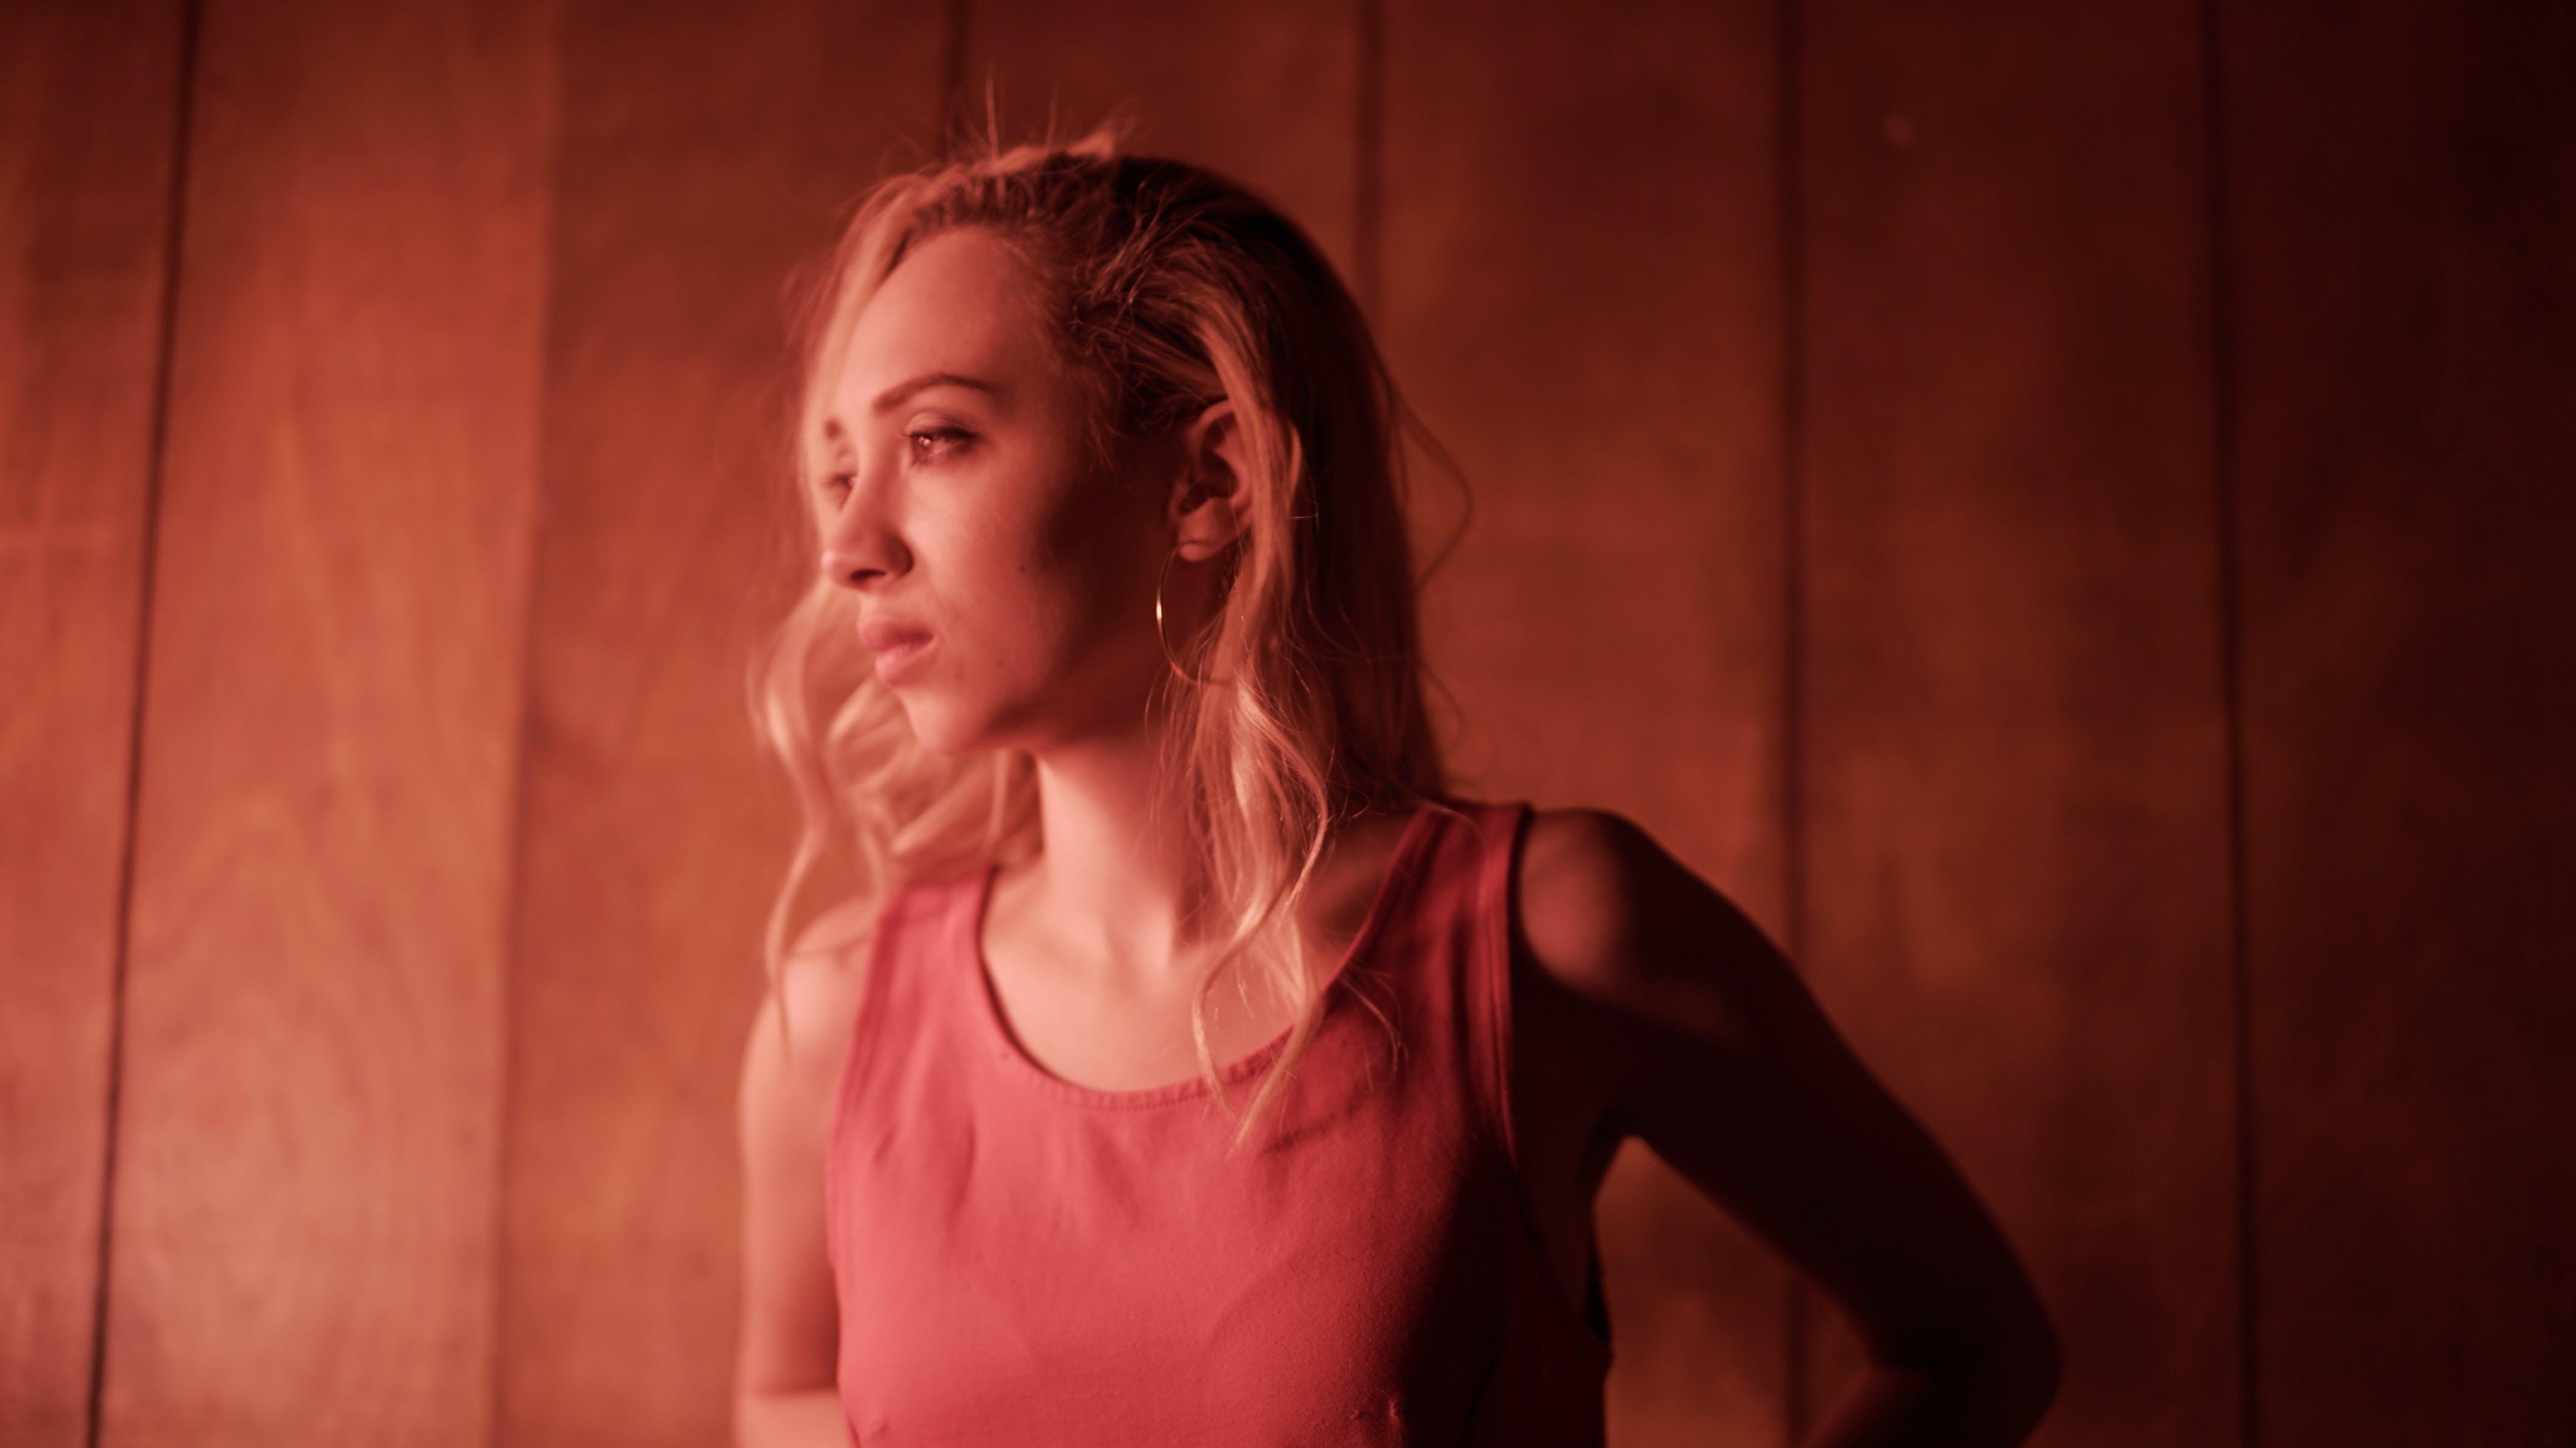 Woman Wearing Pink Sleeveless Tops Standing Near Brown Wooden Wall